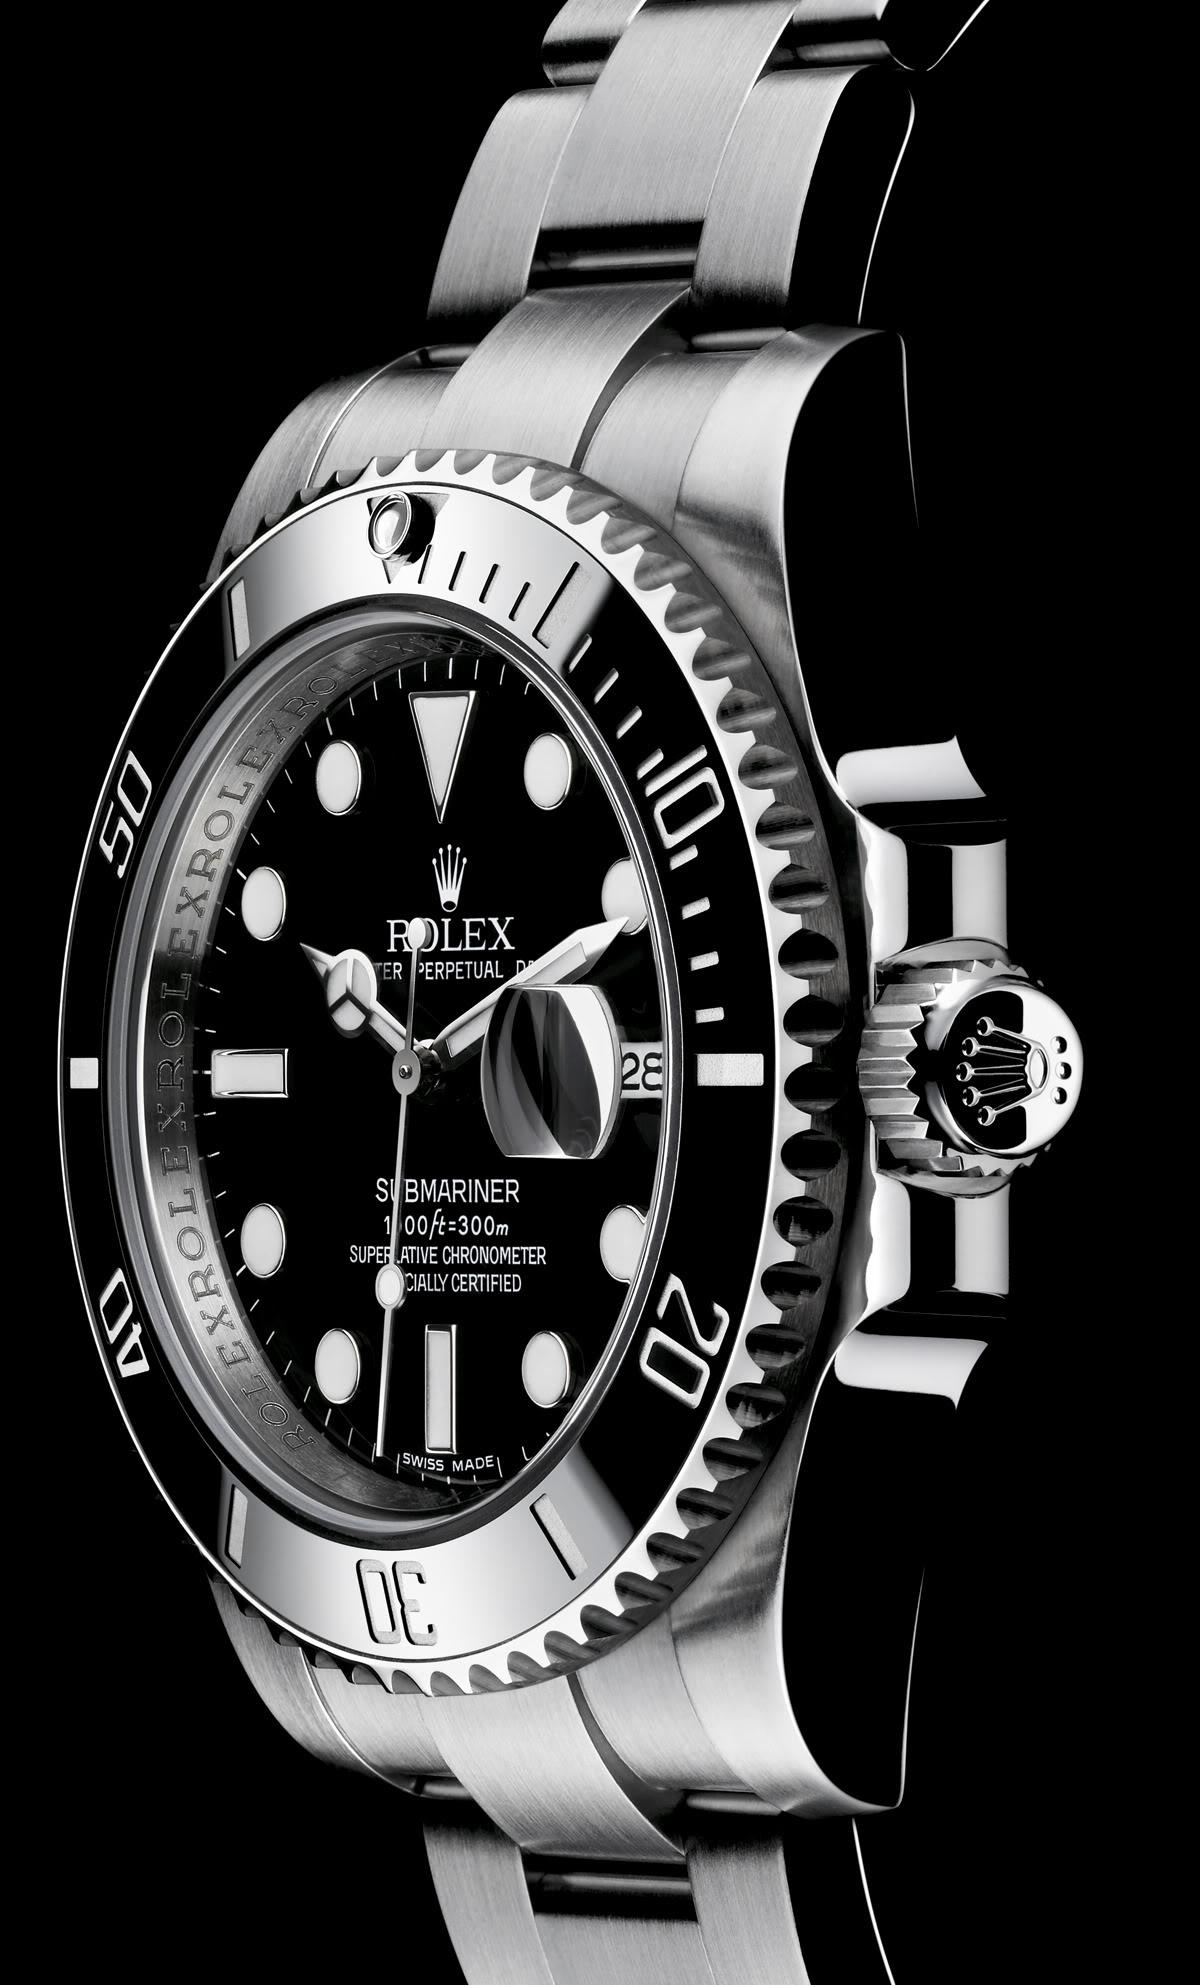 [nouveauté] Rolex submariner SUBMARINER-DATE_6